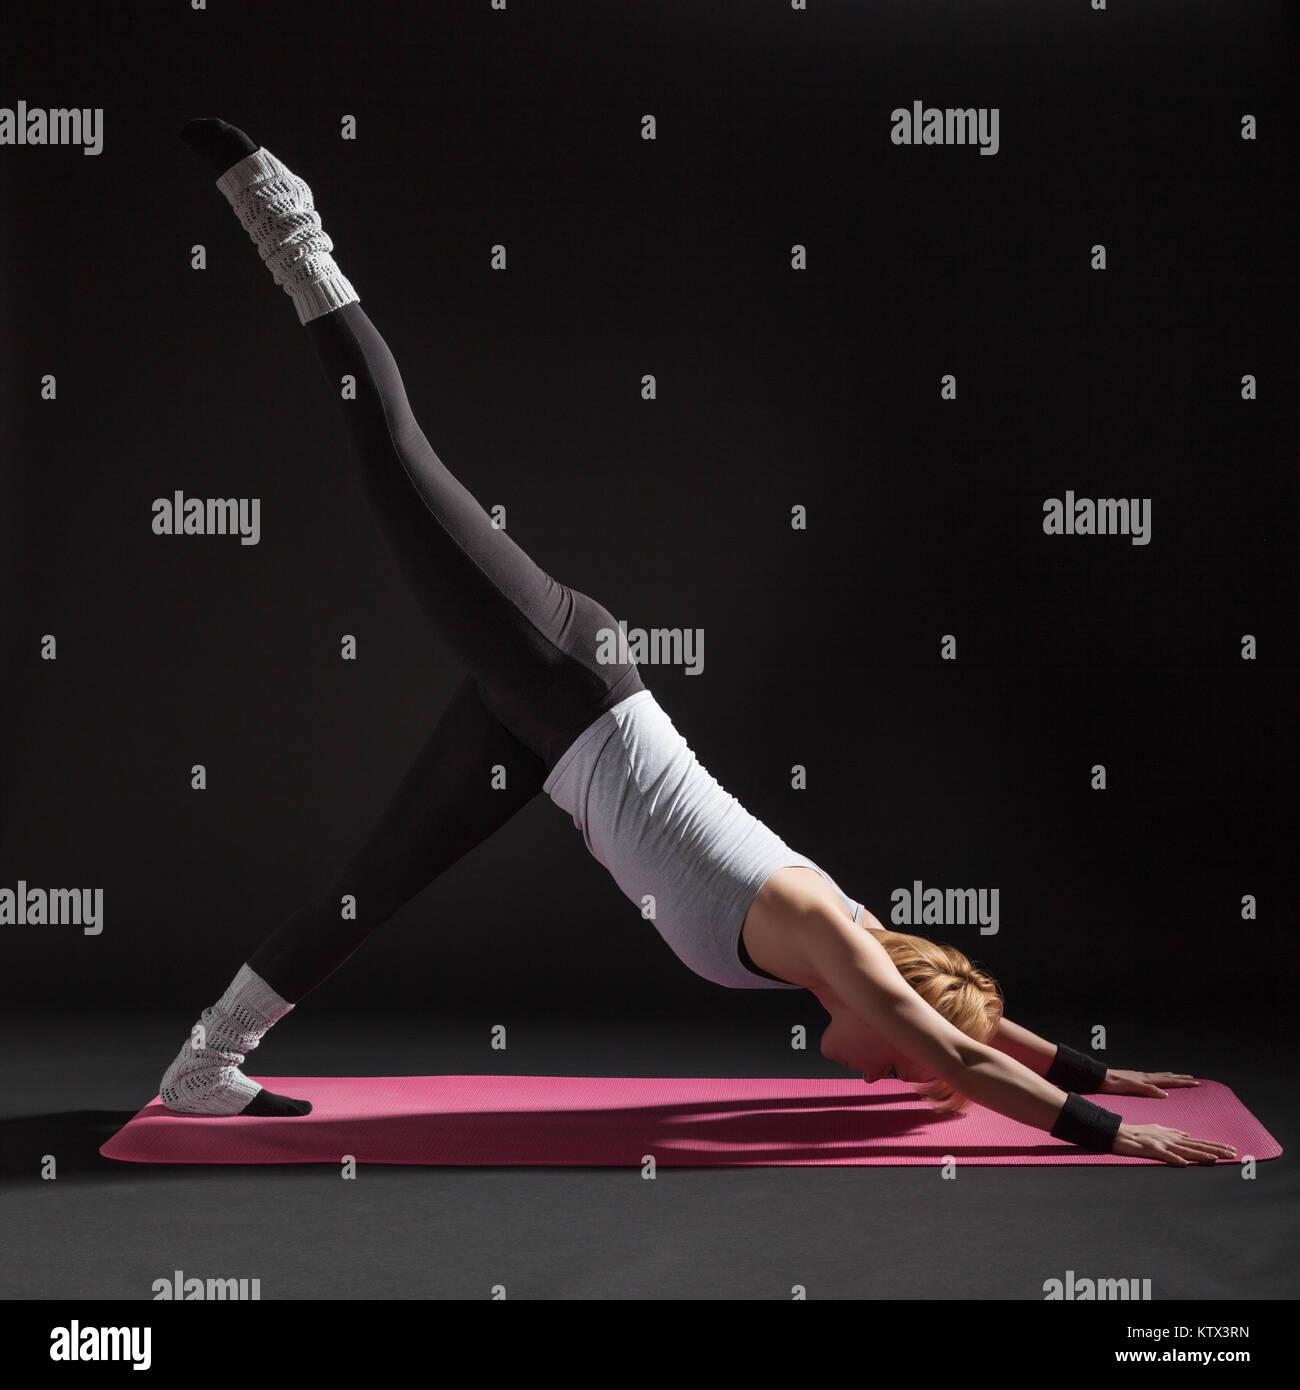 Junge Frau Üben Yoga, Eka Pada Adho Mukha Svanasana/One-Legged Downward-Facing Hund darstellen Stockbild